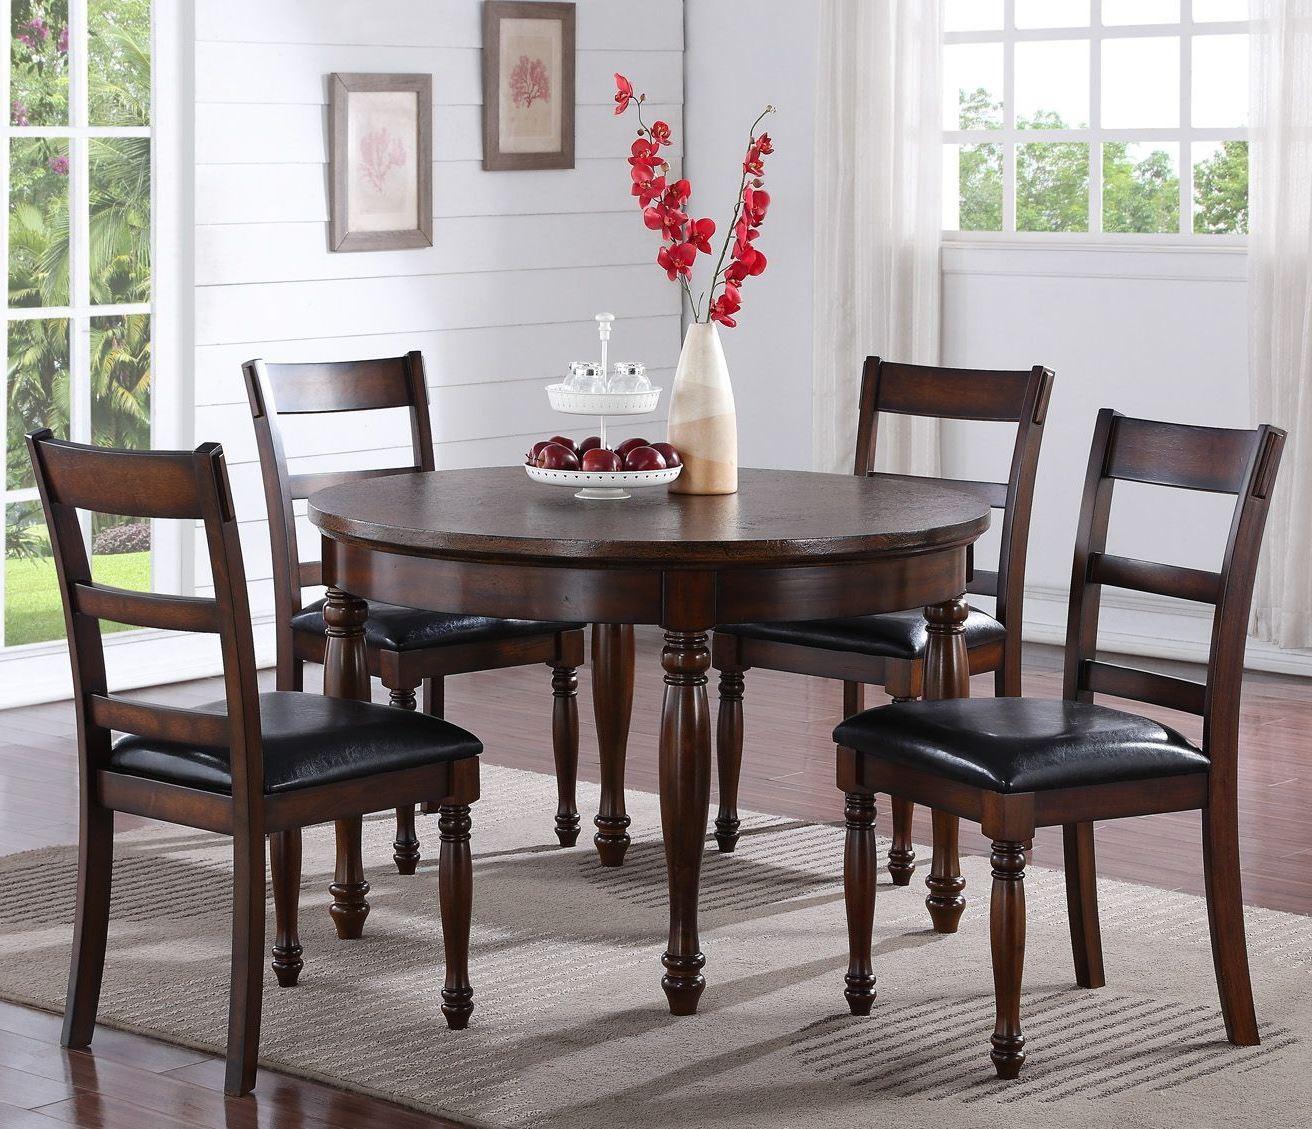 "Dining Room Sets Round: Breckenridge Brown 48"" Round Dining Room Set, ZBRG-8080"